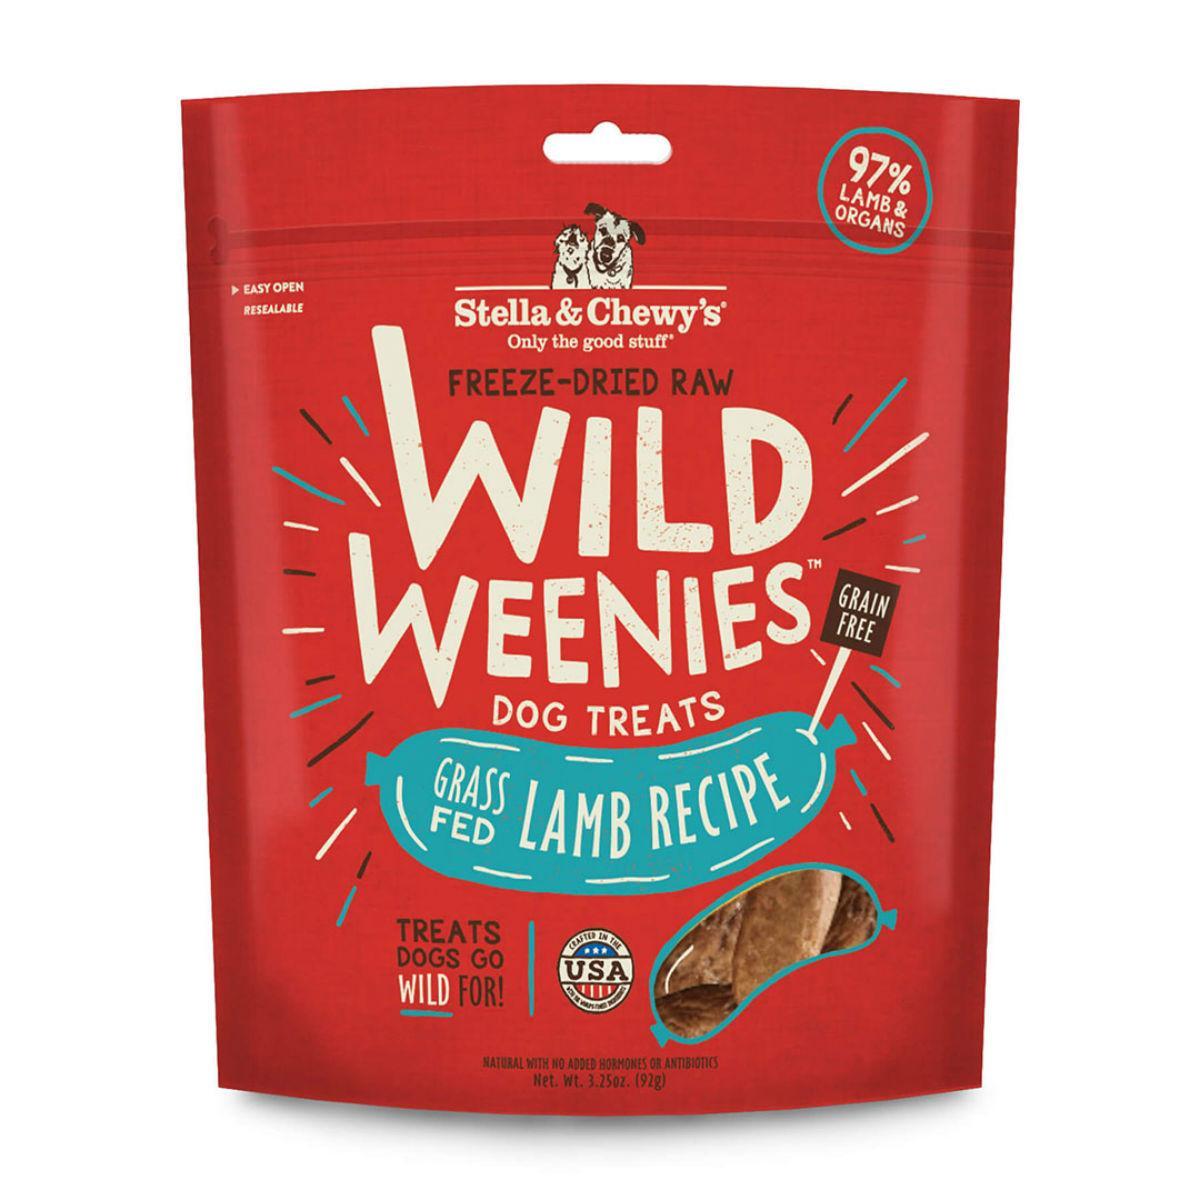 Stella & Chewy's Wild Weenies Freeze-Dried Raw Dog Treats - Lamb